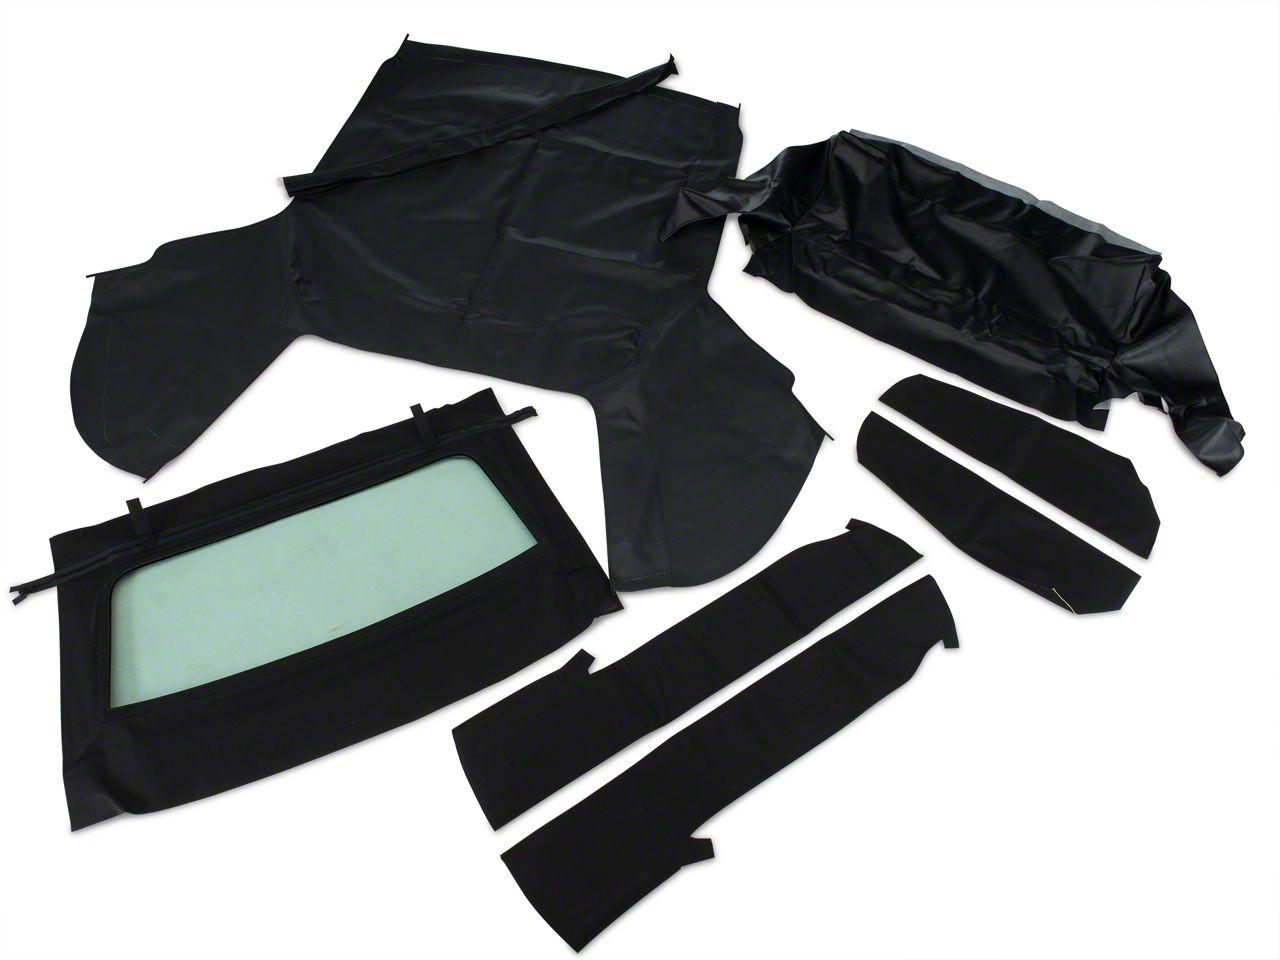 OPR Convertible Top Kit - Black (91-93 Convertible)